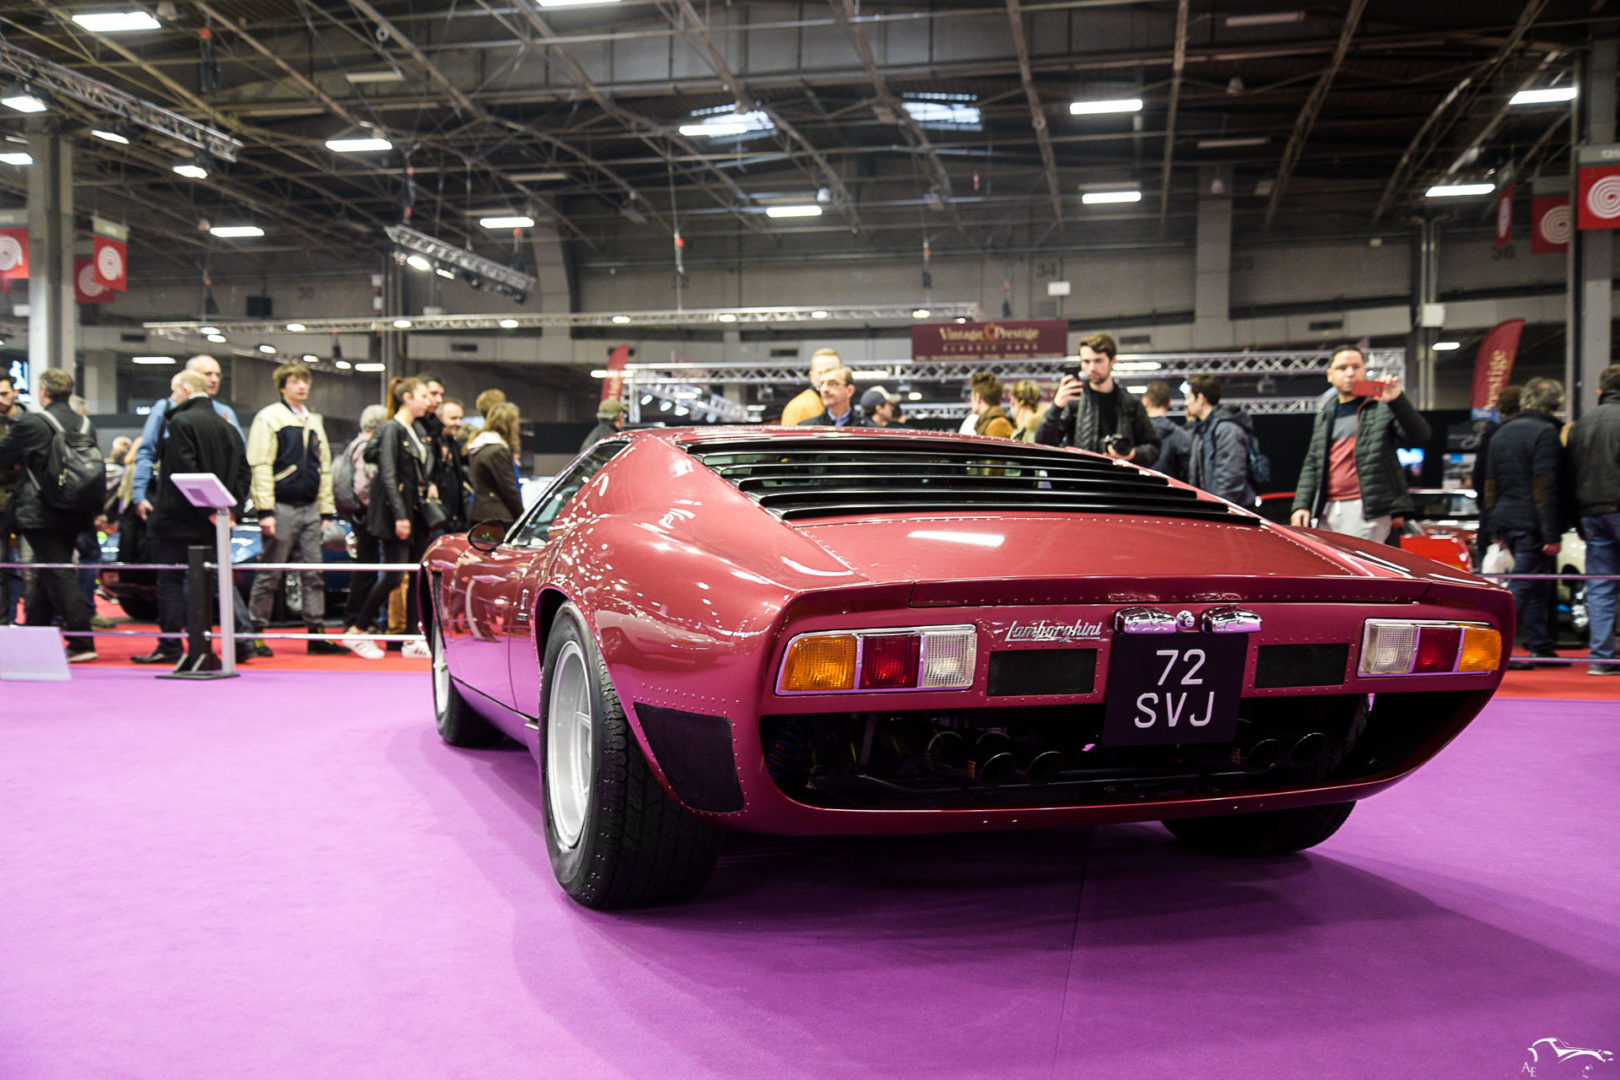 Lamborghini Miura SVJ